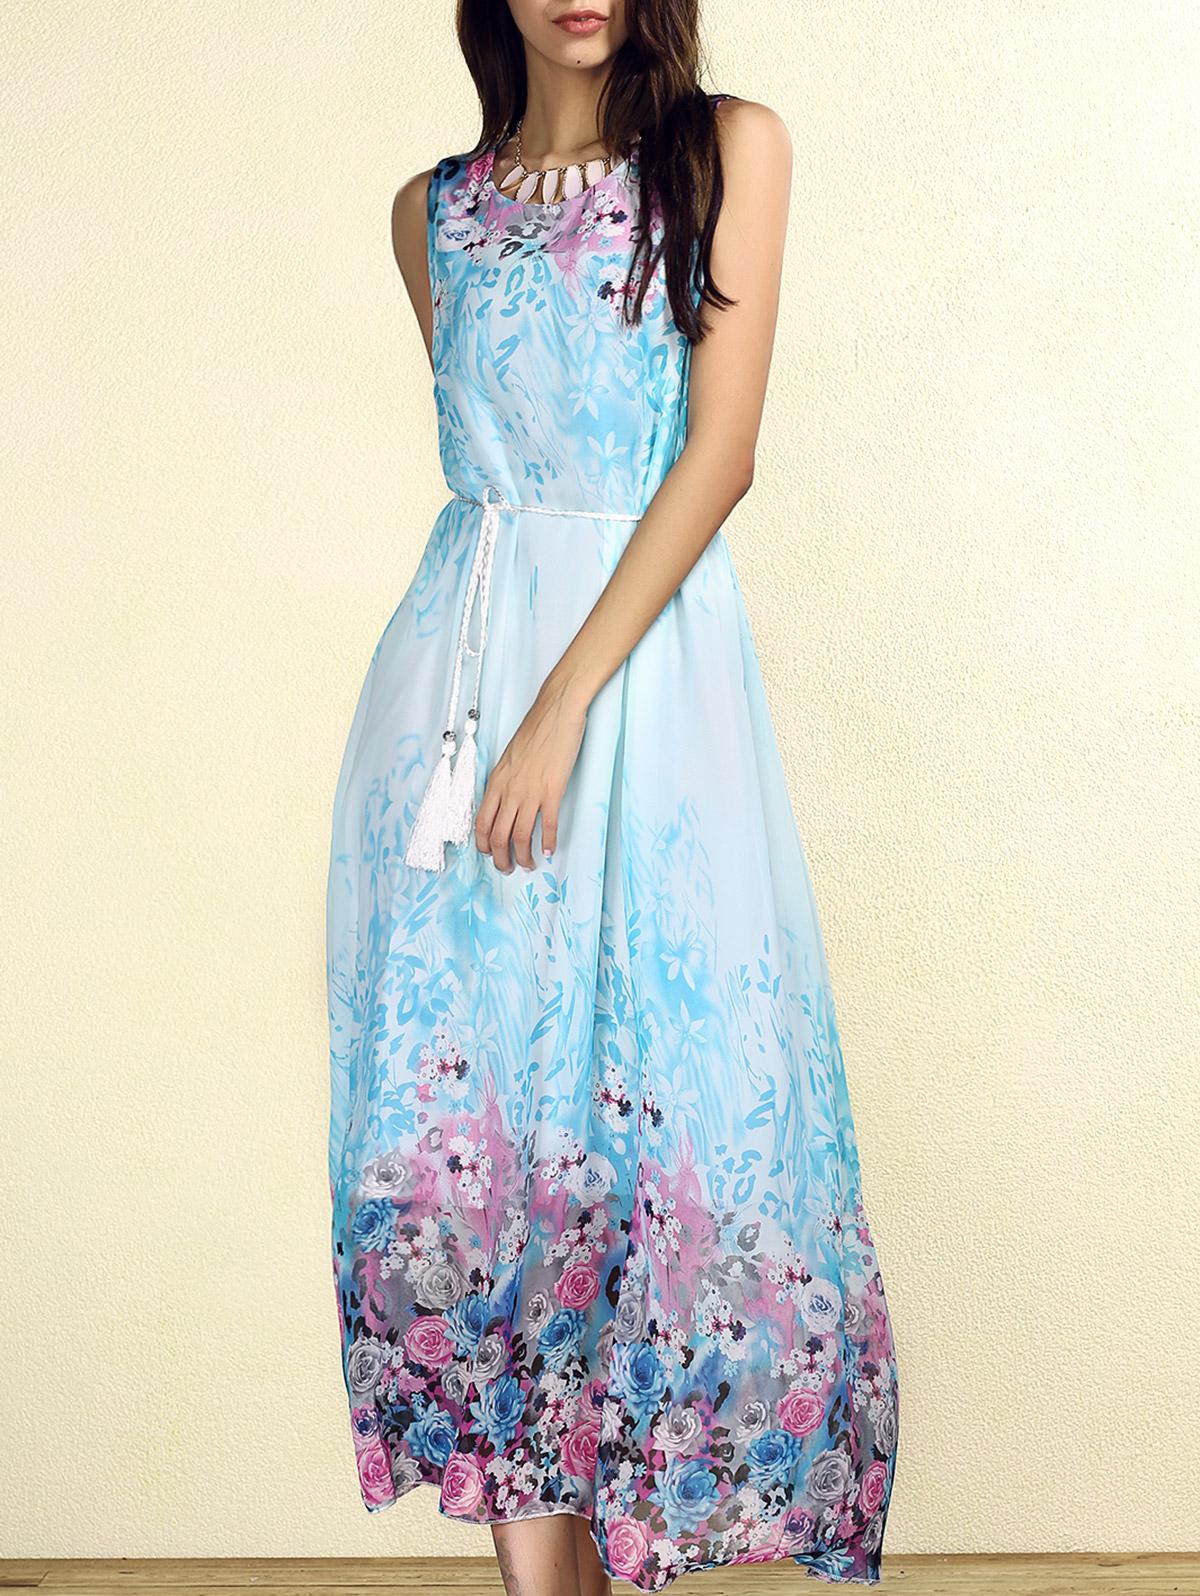 Bohemian Round Collar Sleeveless Floral Print Women's Dress